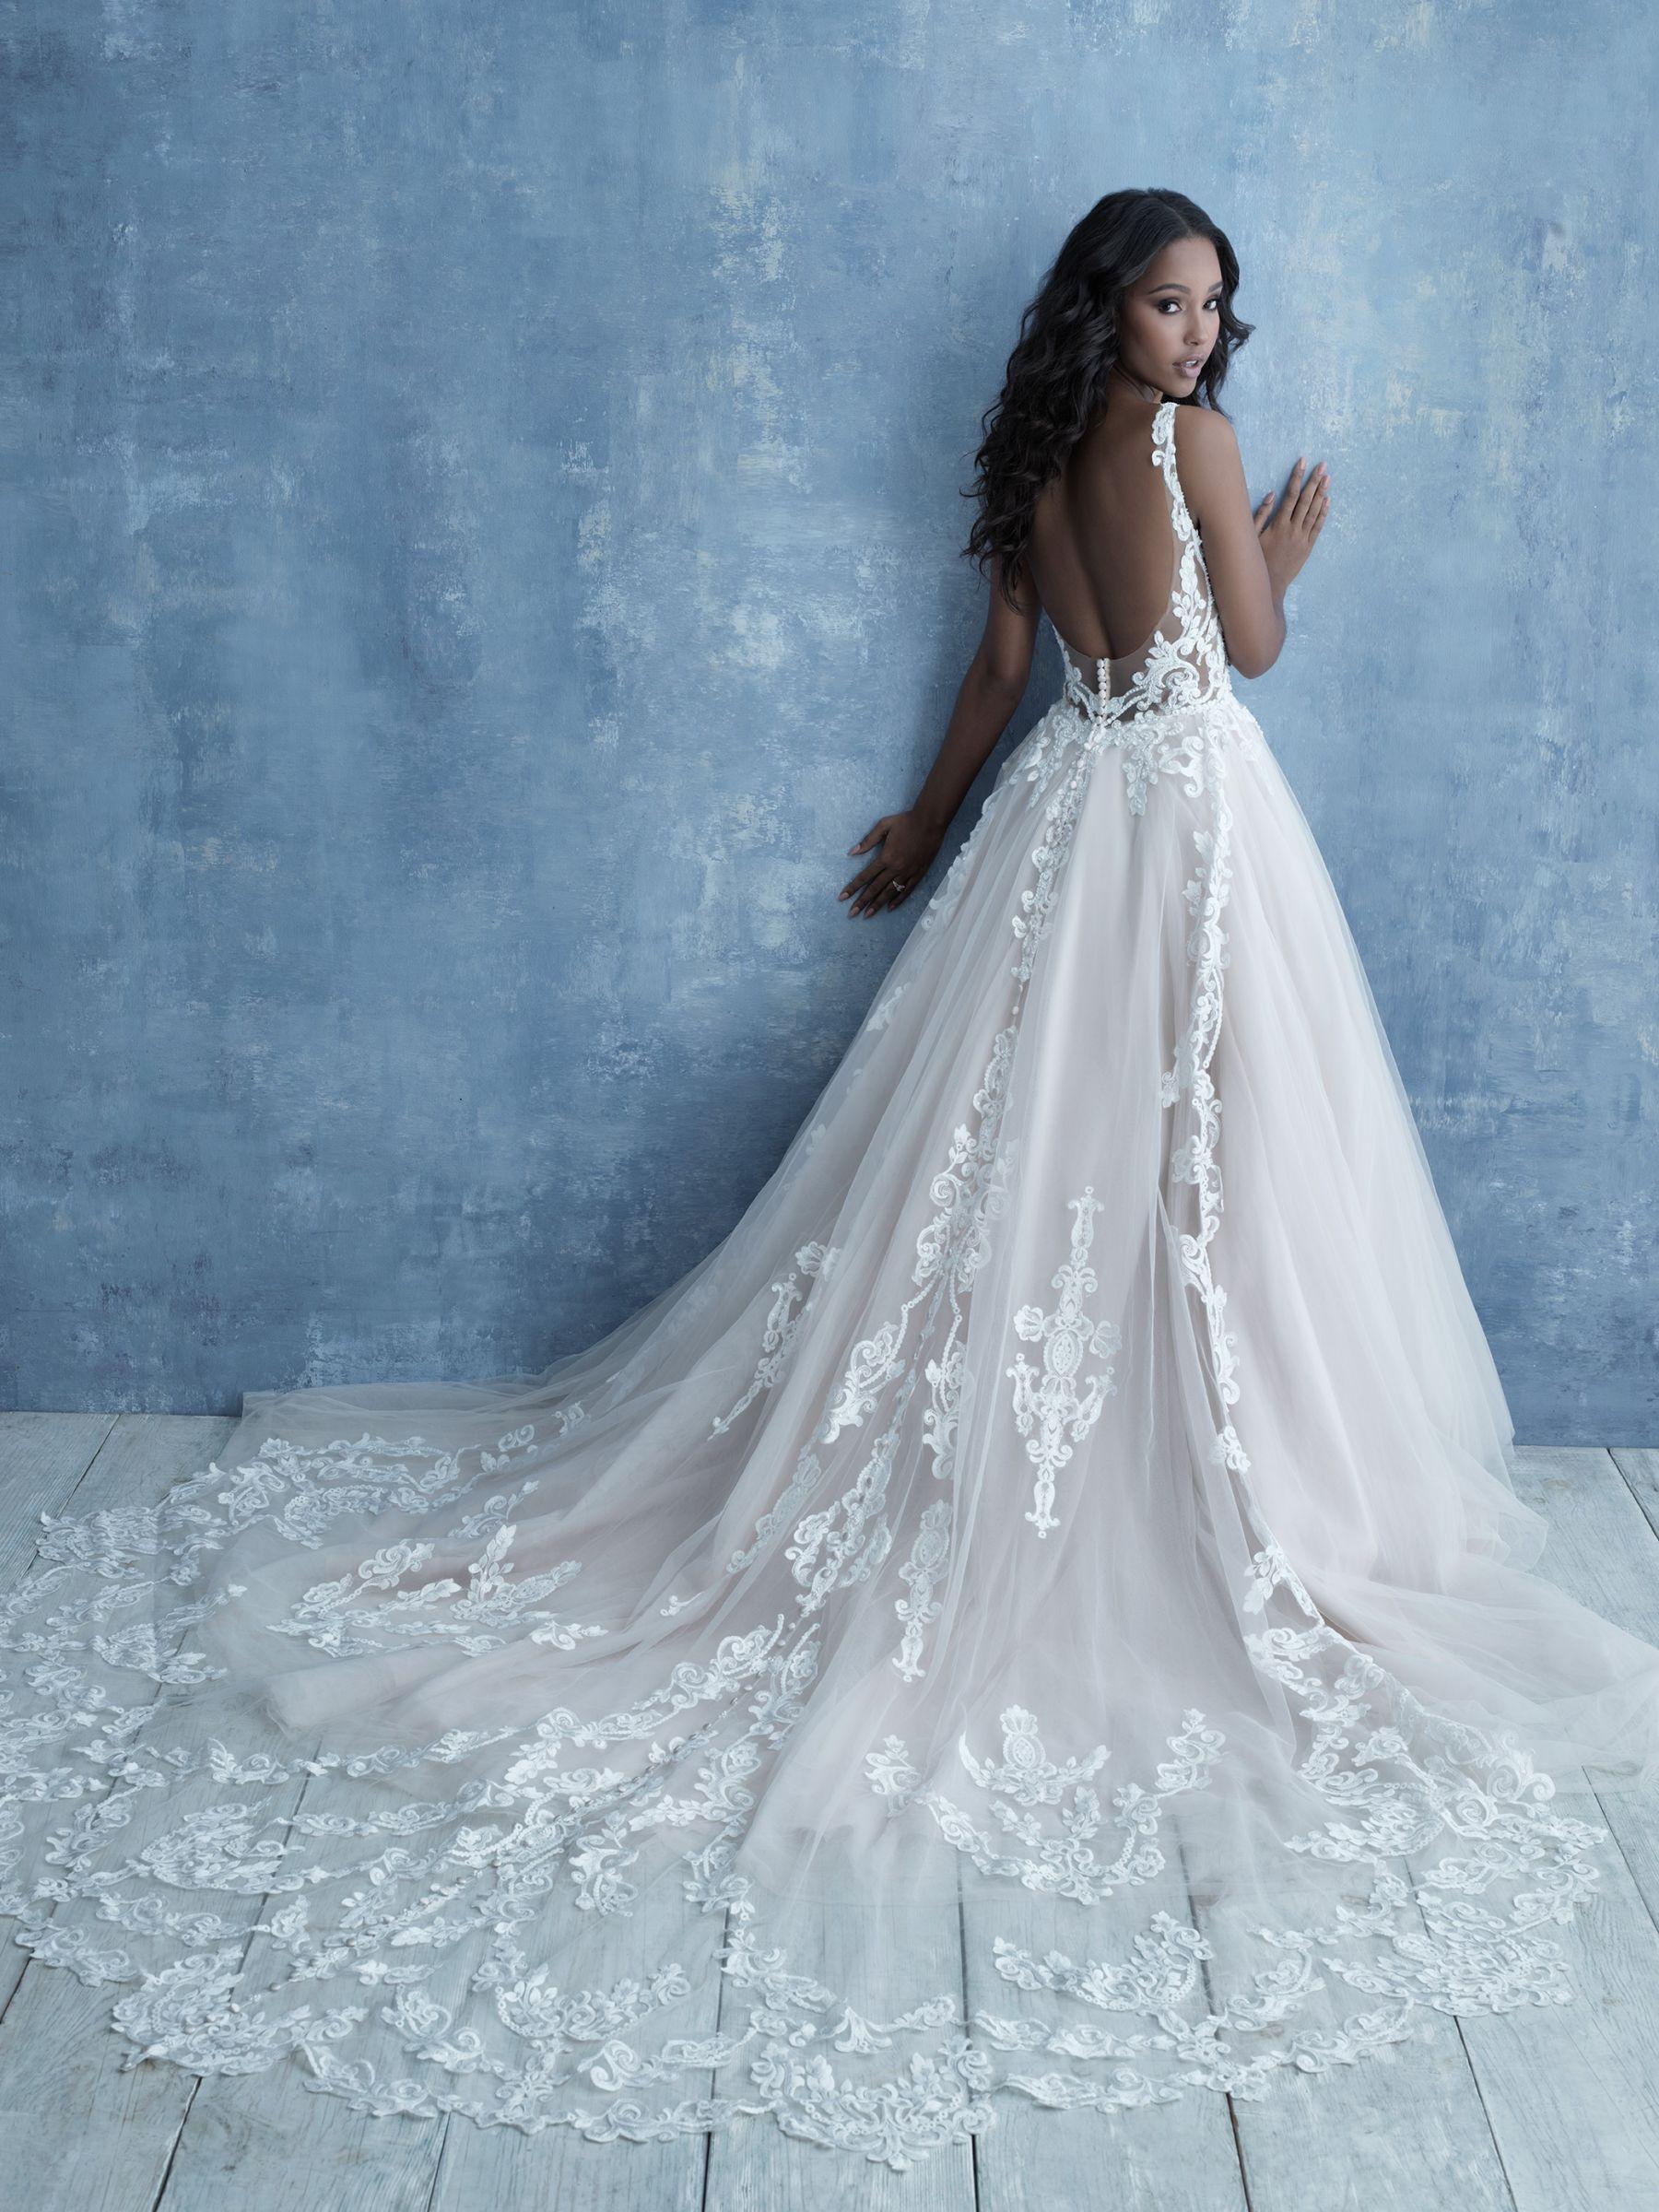 Allure Bridal Stunning Dress Style: 9703